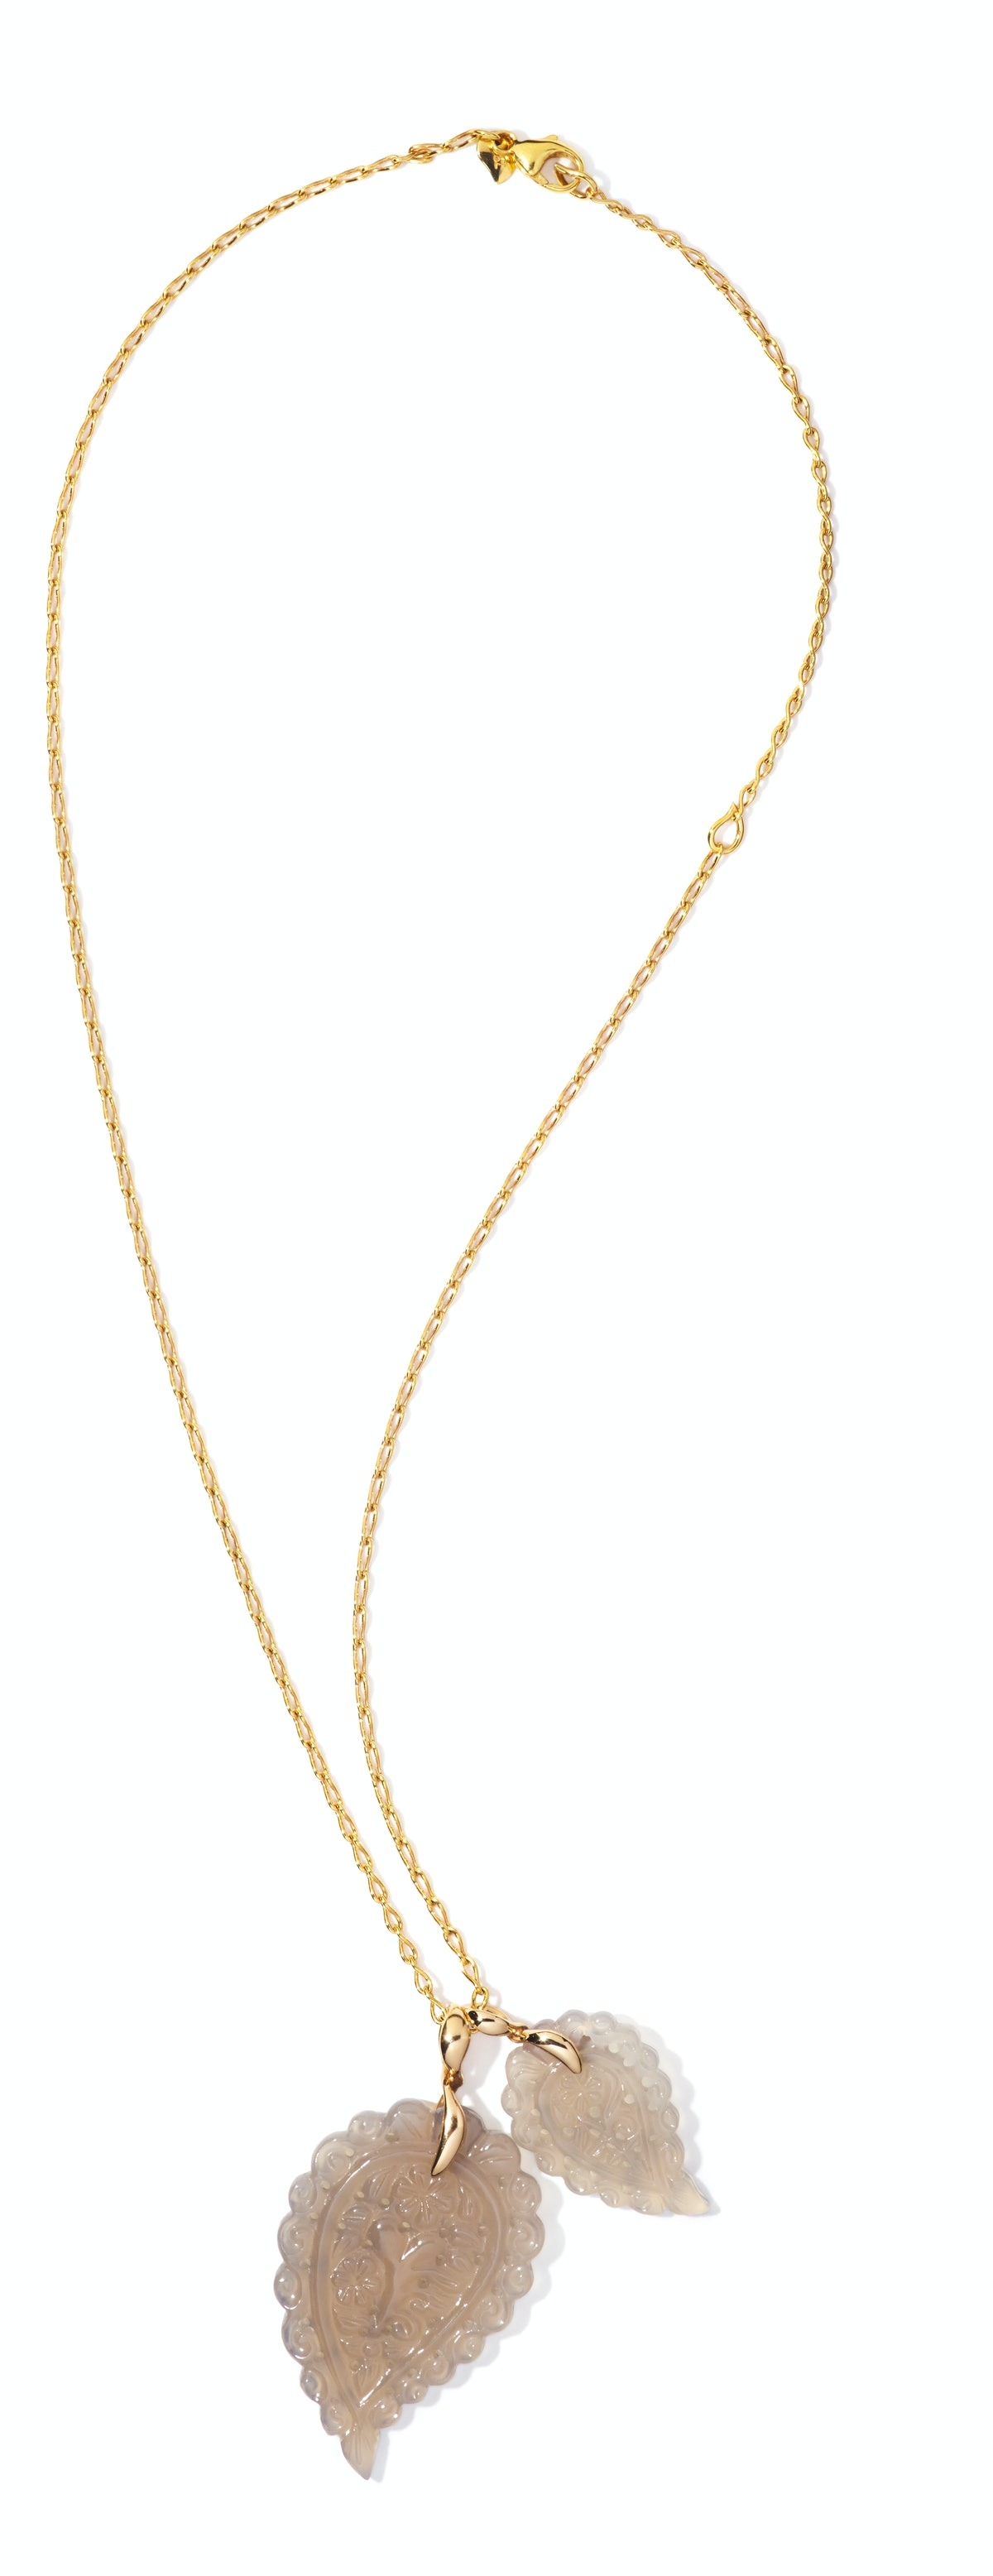 Tamara Comolli small pendant